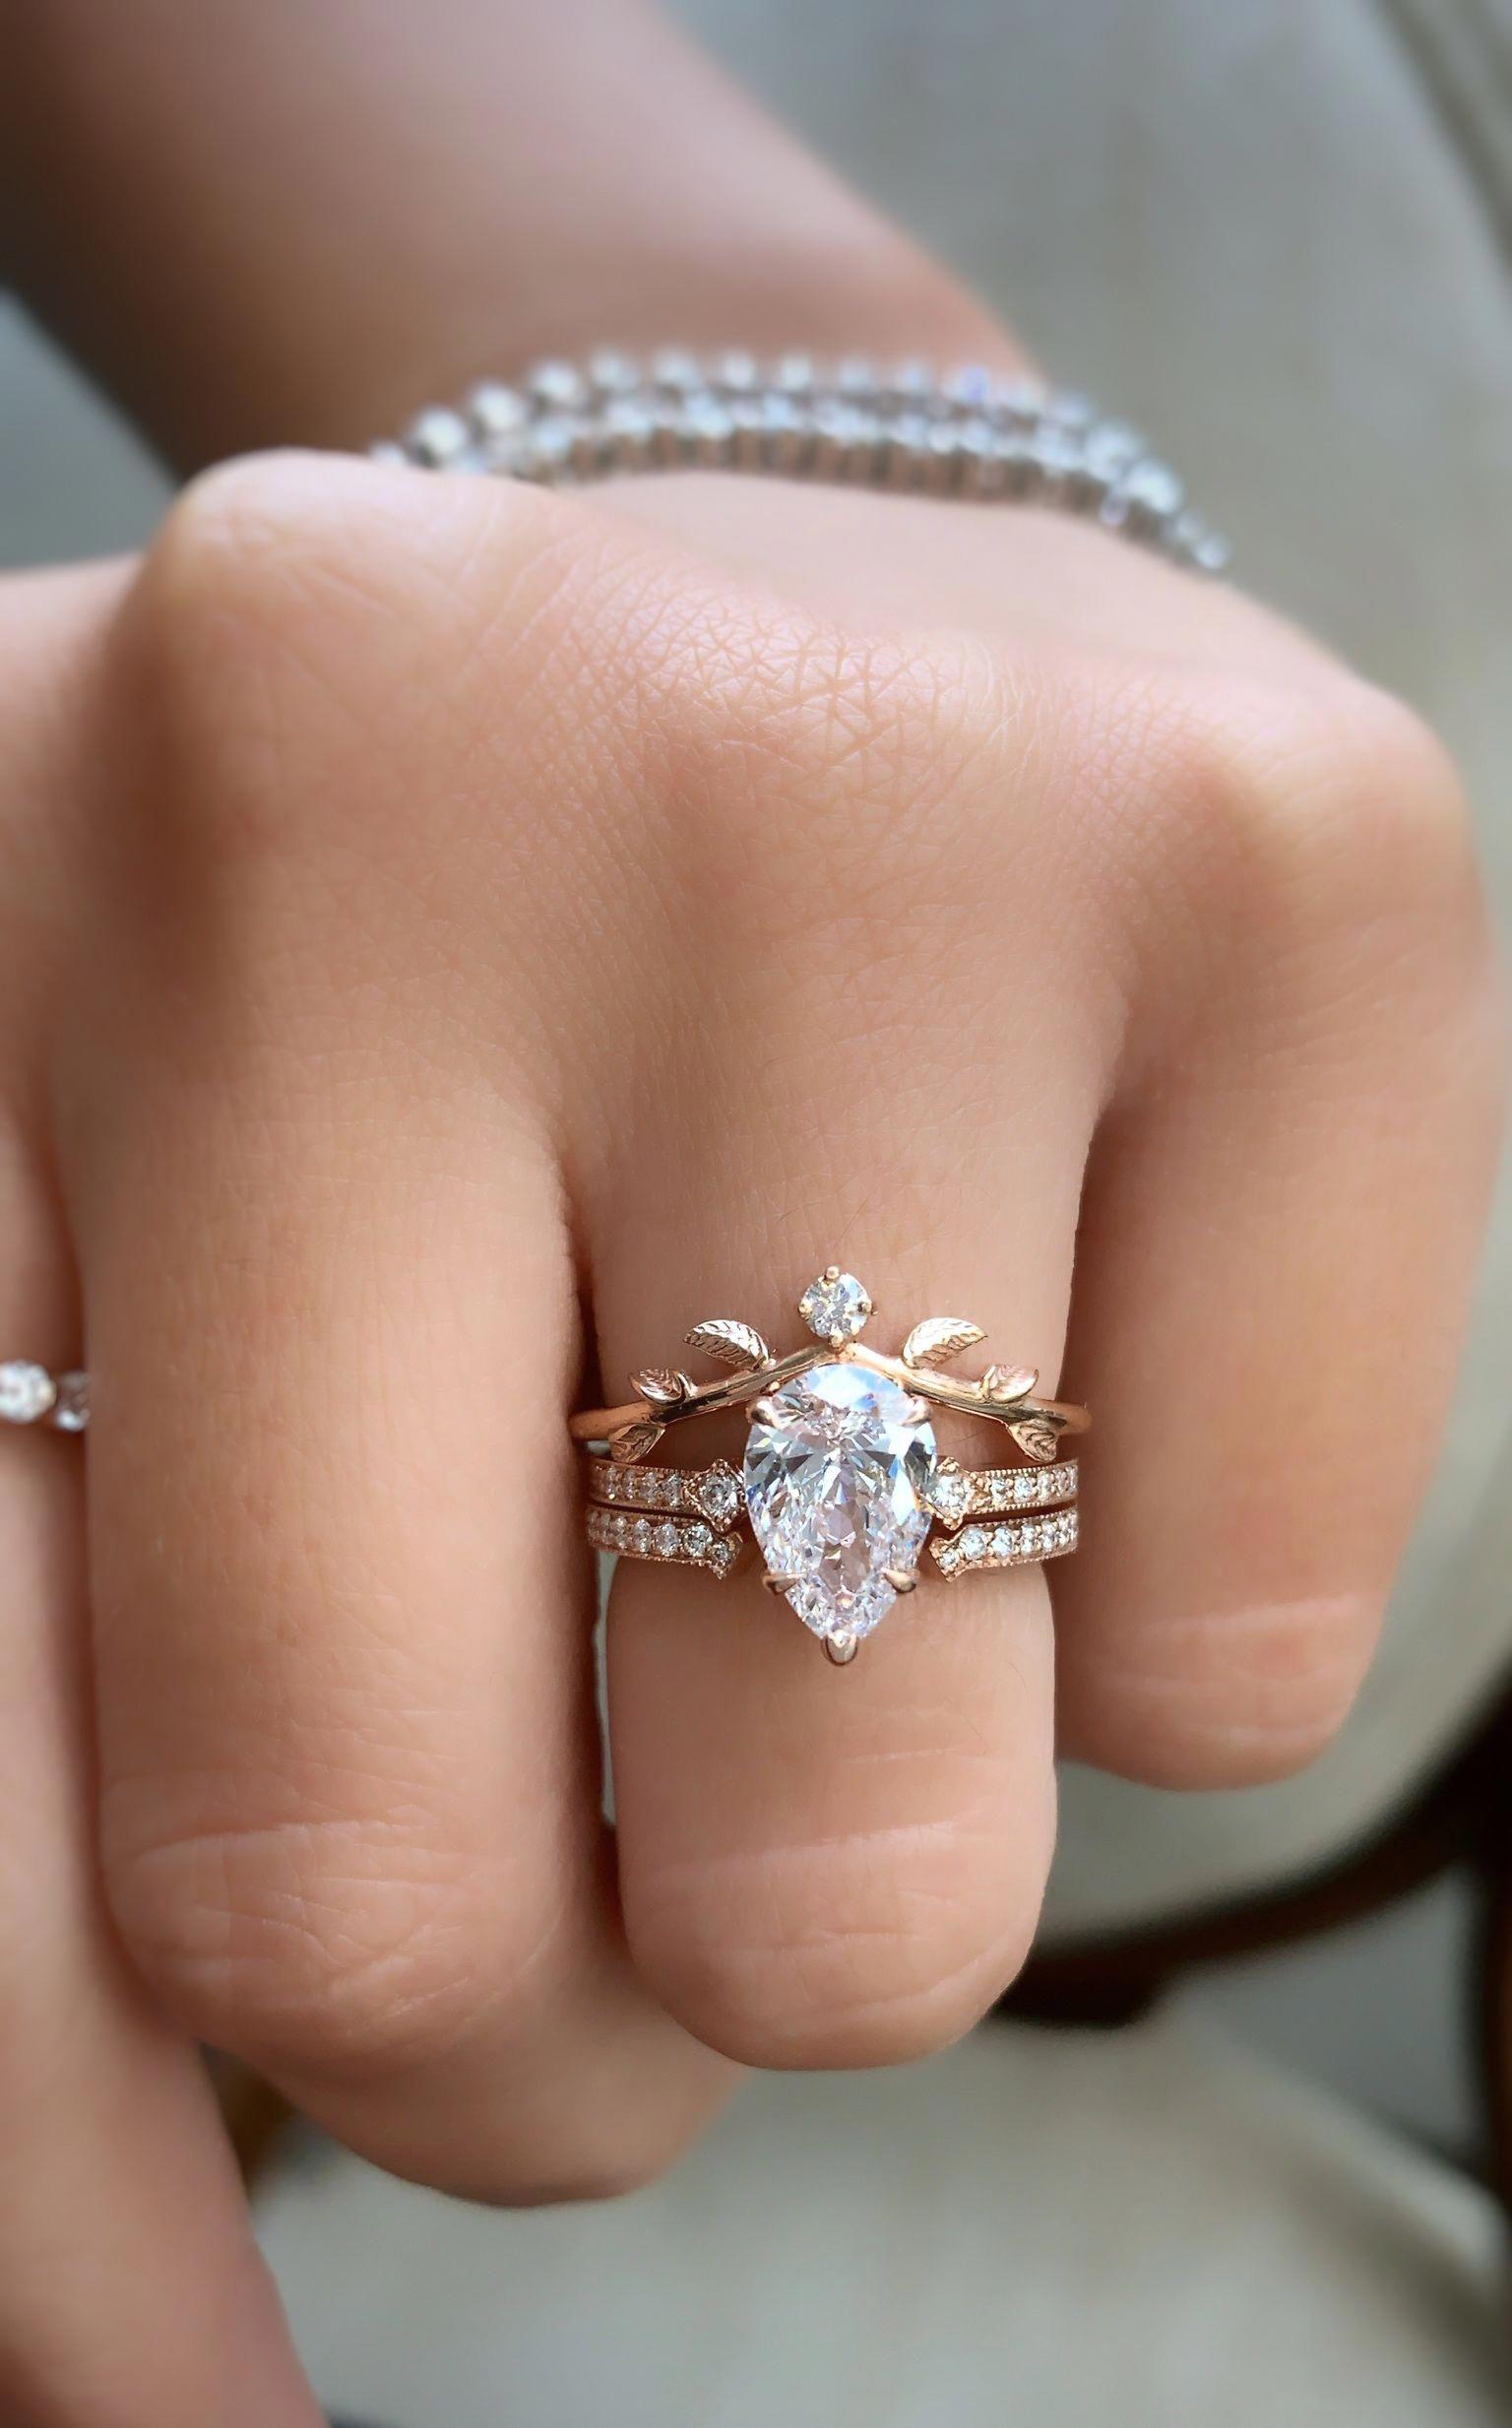 rings in 2020 Diamond wedding rings, Dream engagement